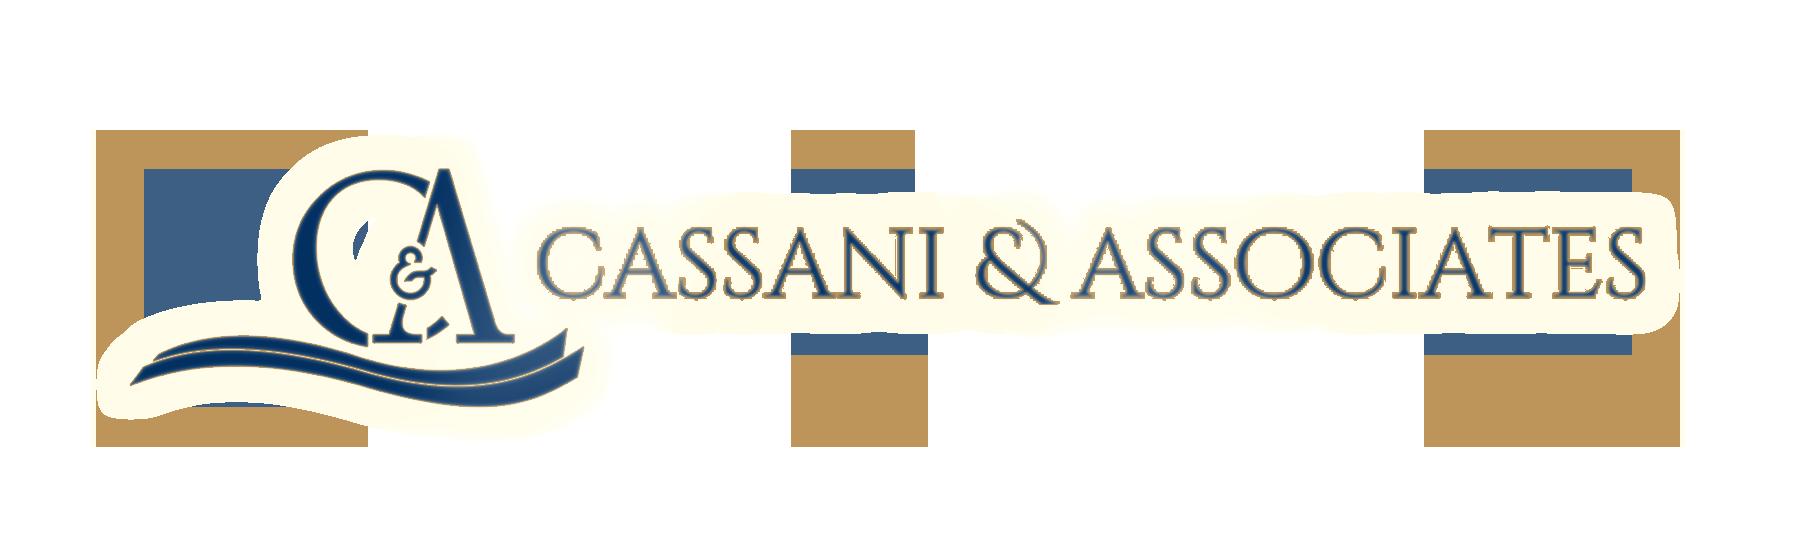 Cassani & Associates